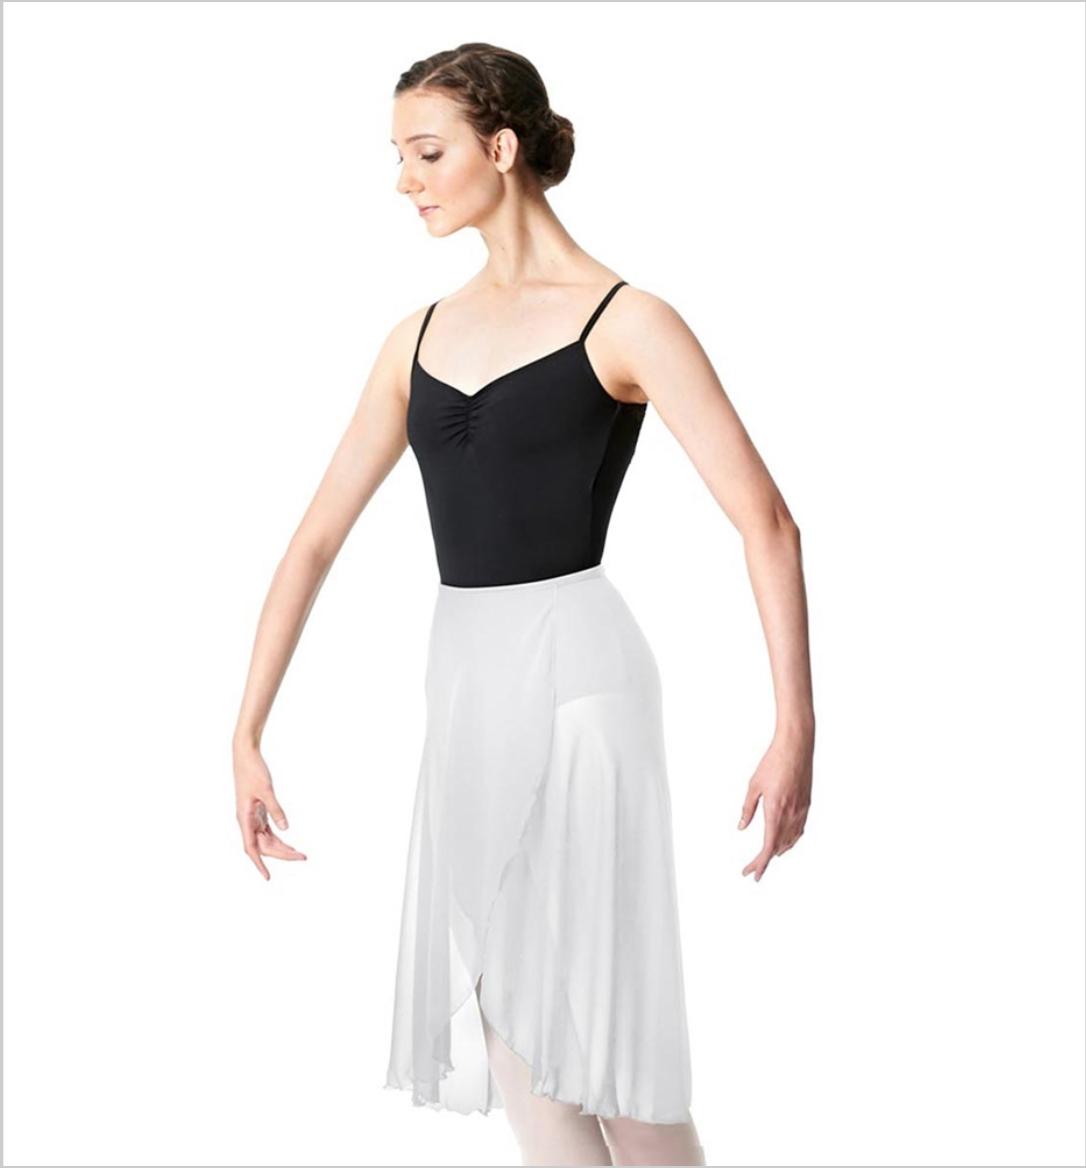 Wrap Chiffon Ballet Long Skirt Addison LUB249